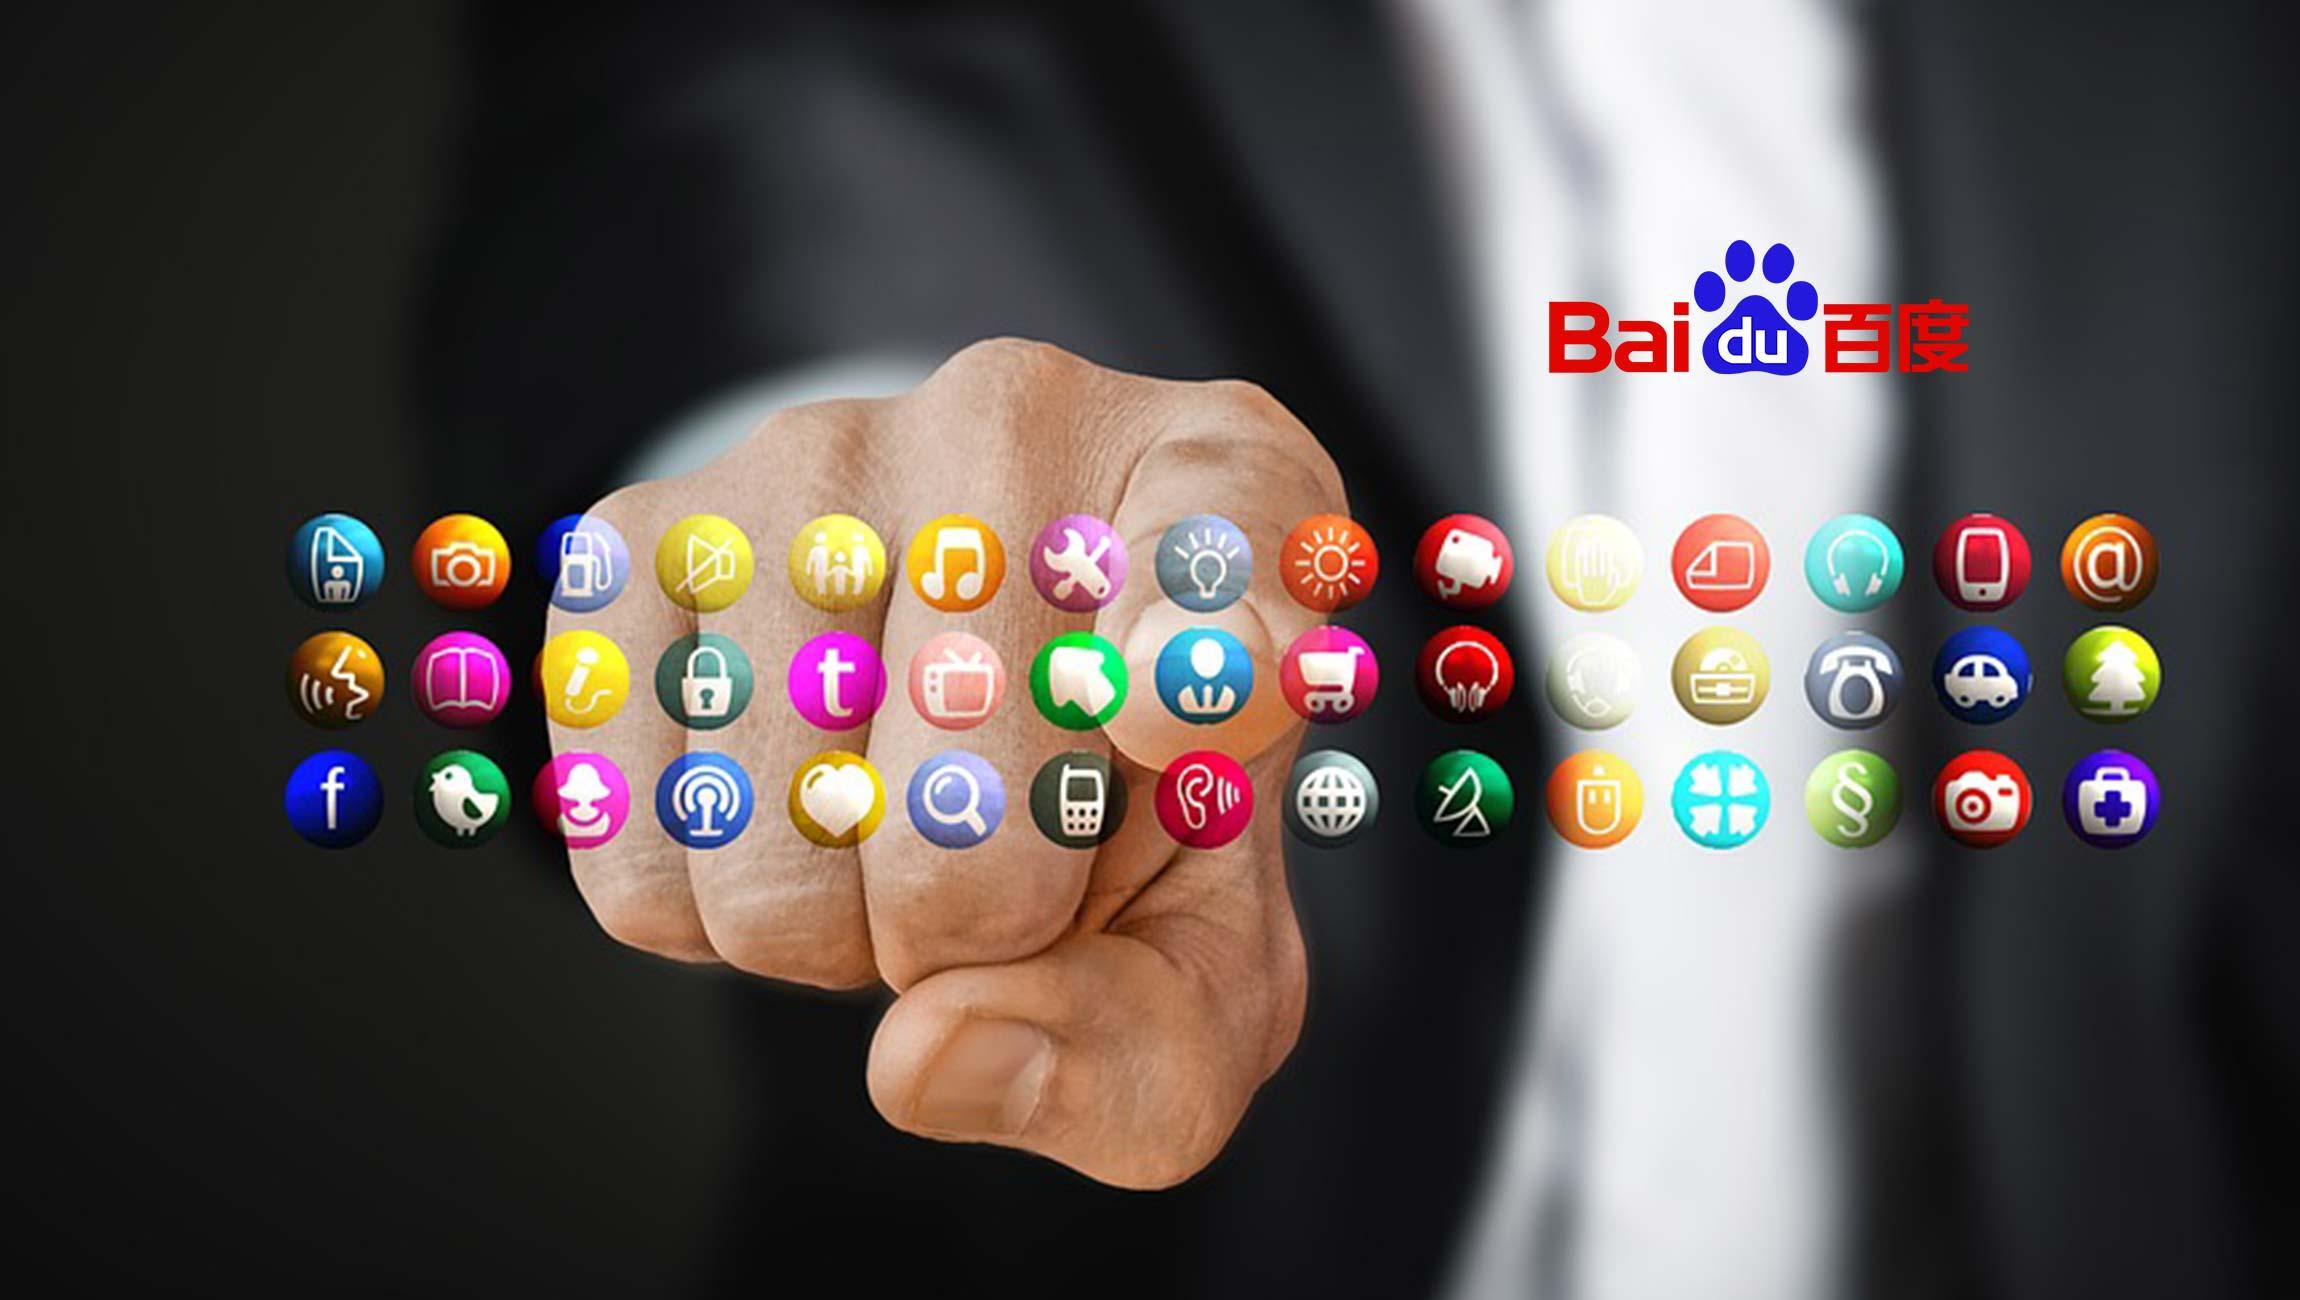 Baidu Announces Smart Words Prediction Feature on Facemoji Keyboard App